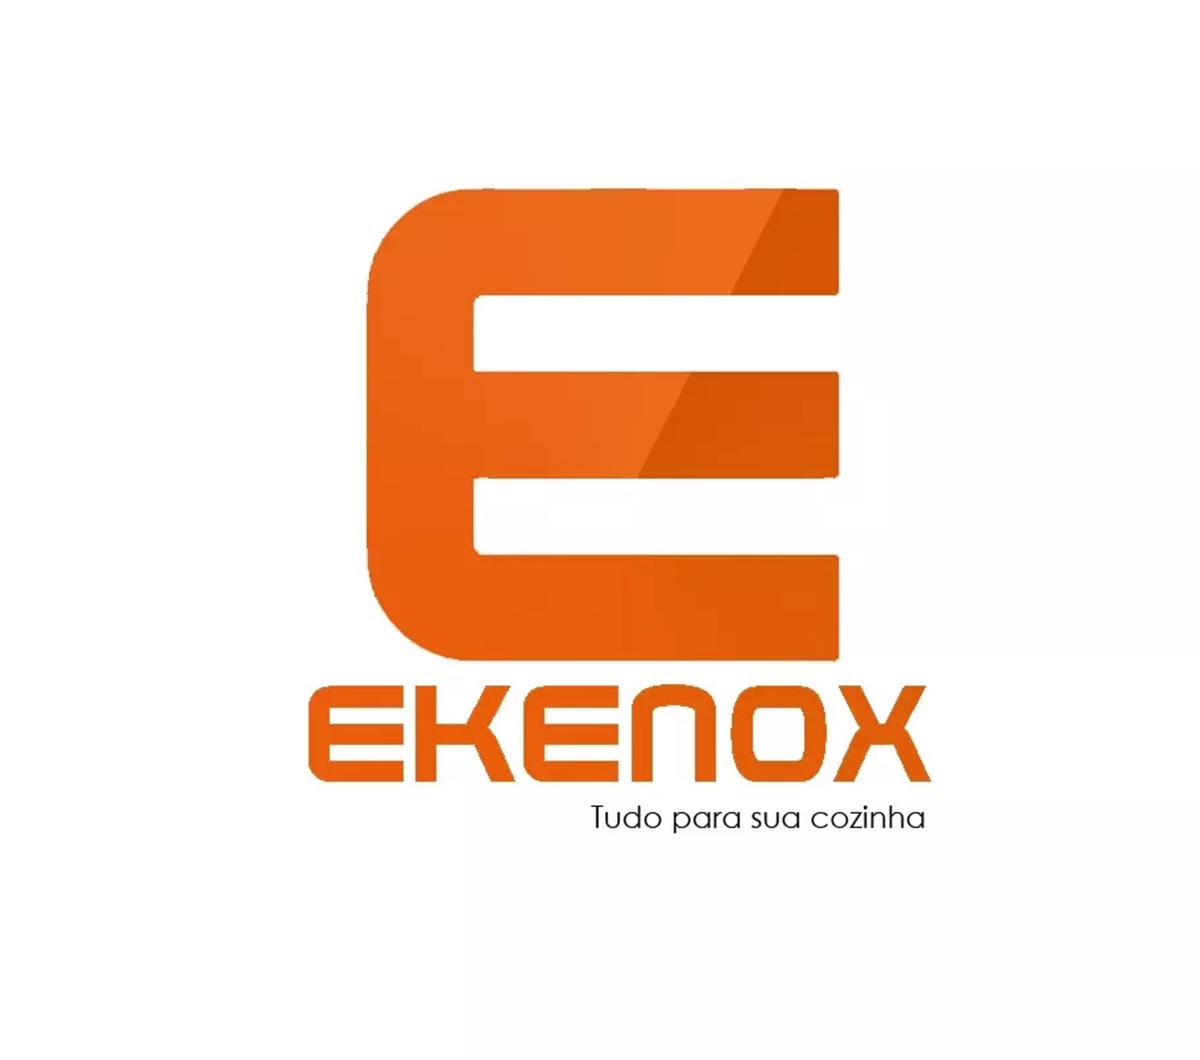 MESA INOX PE BRANCO 190X70CM PG  - EKENOX- Equipamentos Industriais